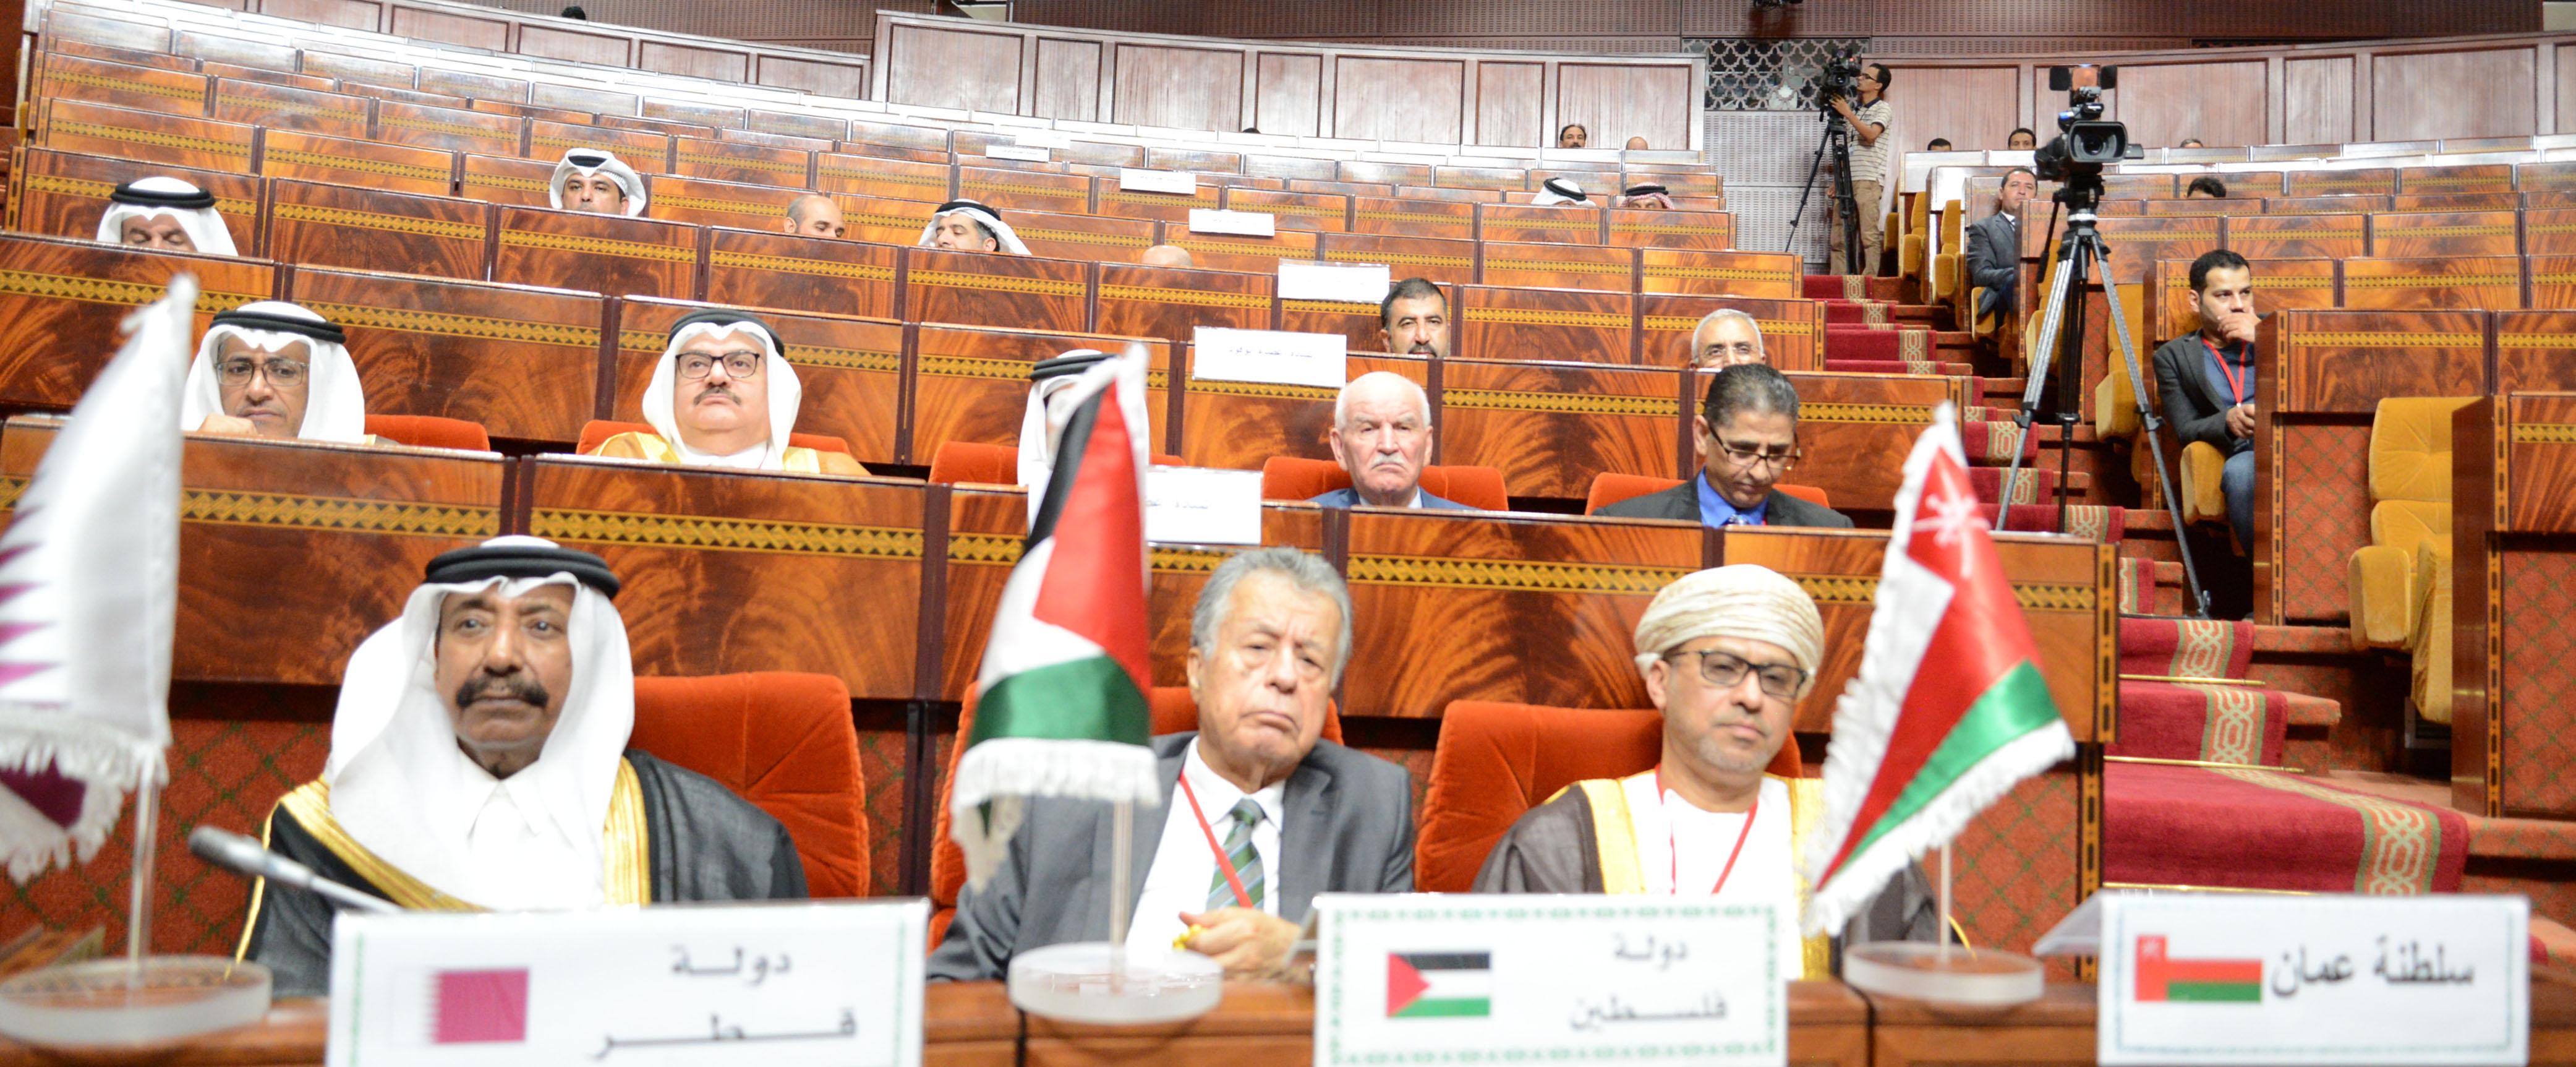 L'UPA condamne vigoureusement les exactions sionistes